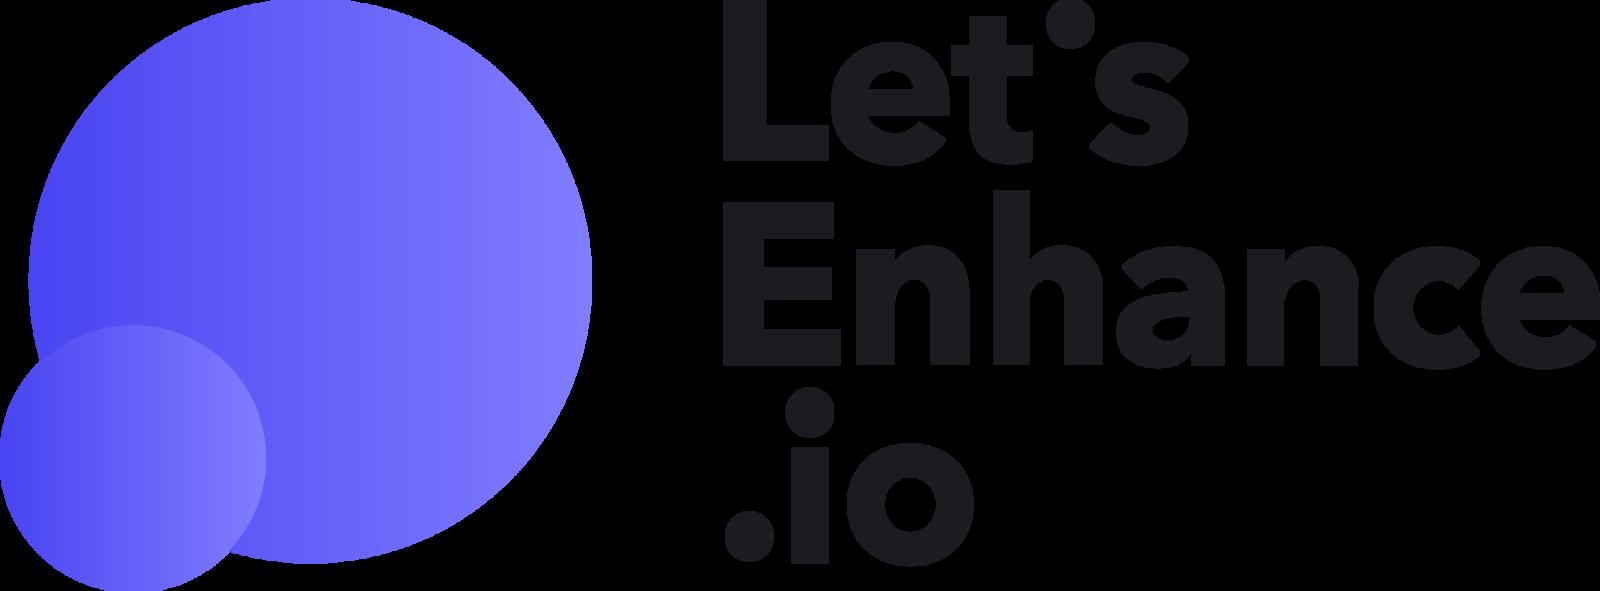 Let's Enhance Help Center